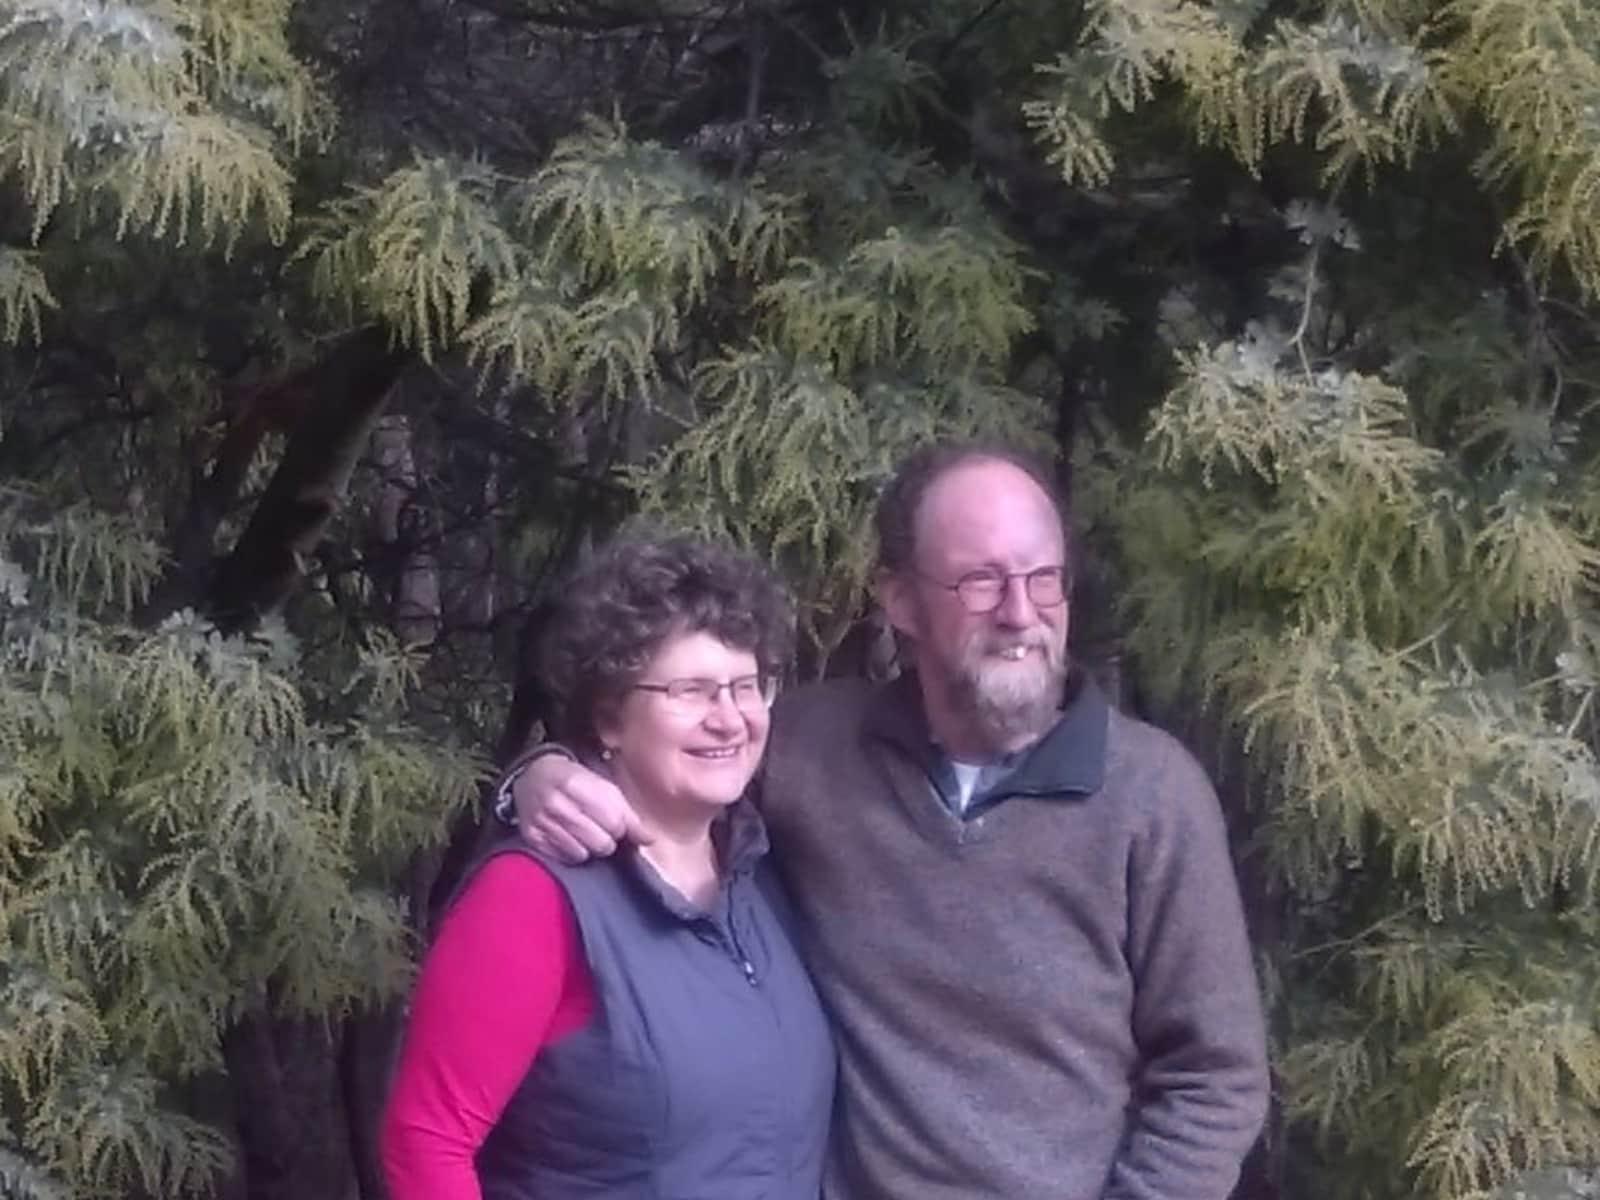 Anthea & Colin from Bendigo, Victoria, Australia